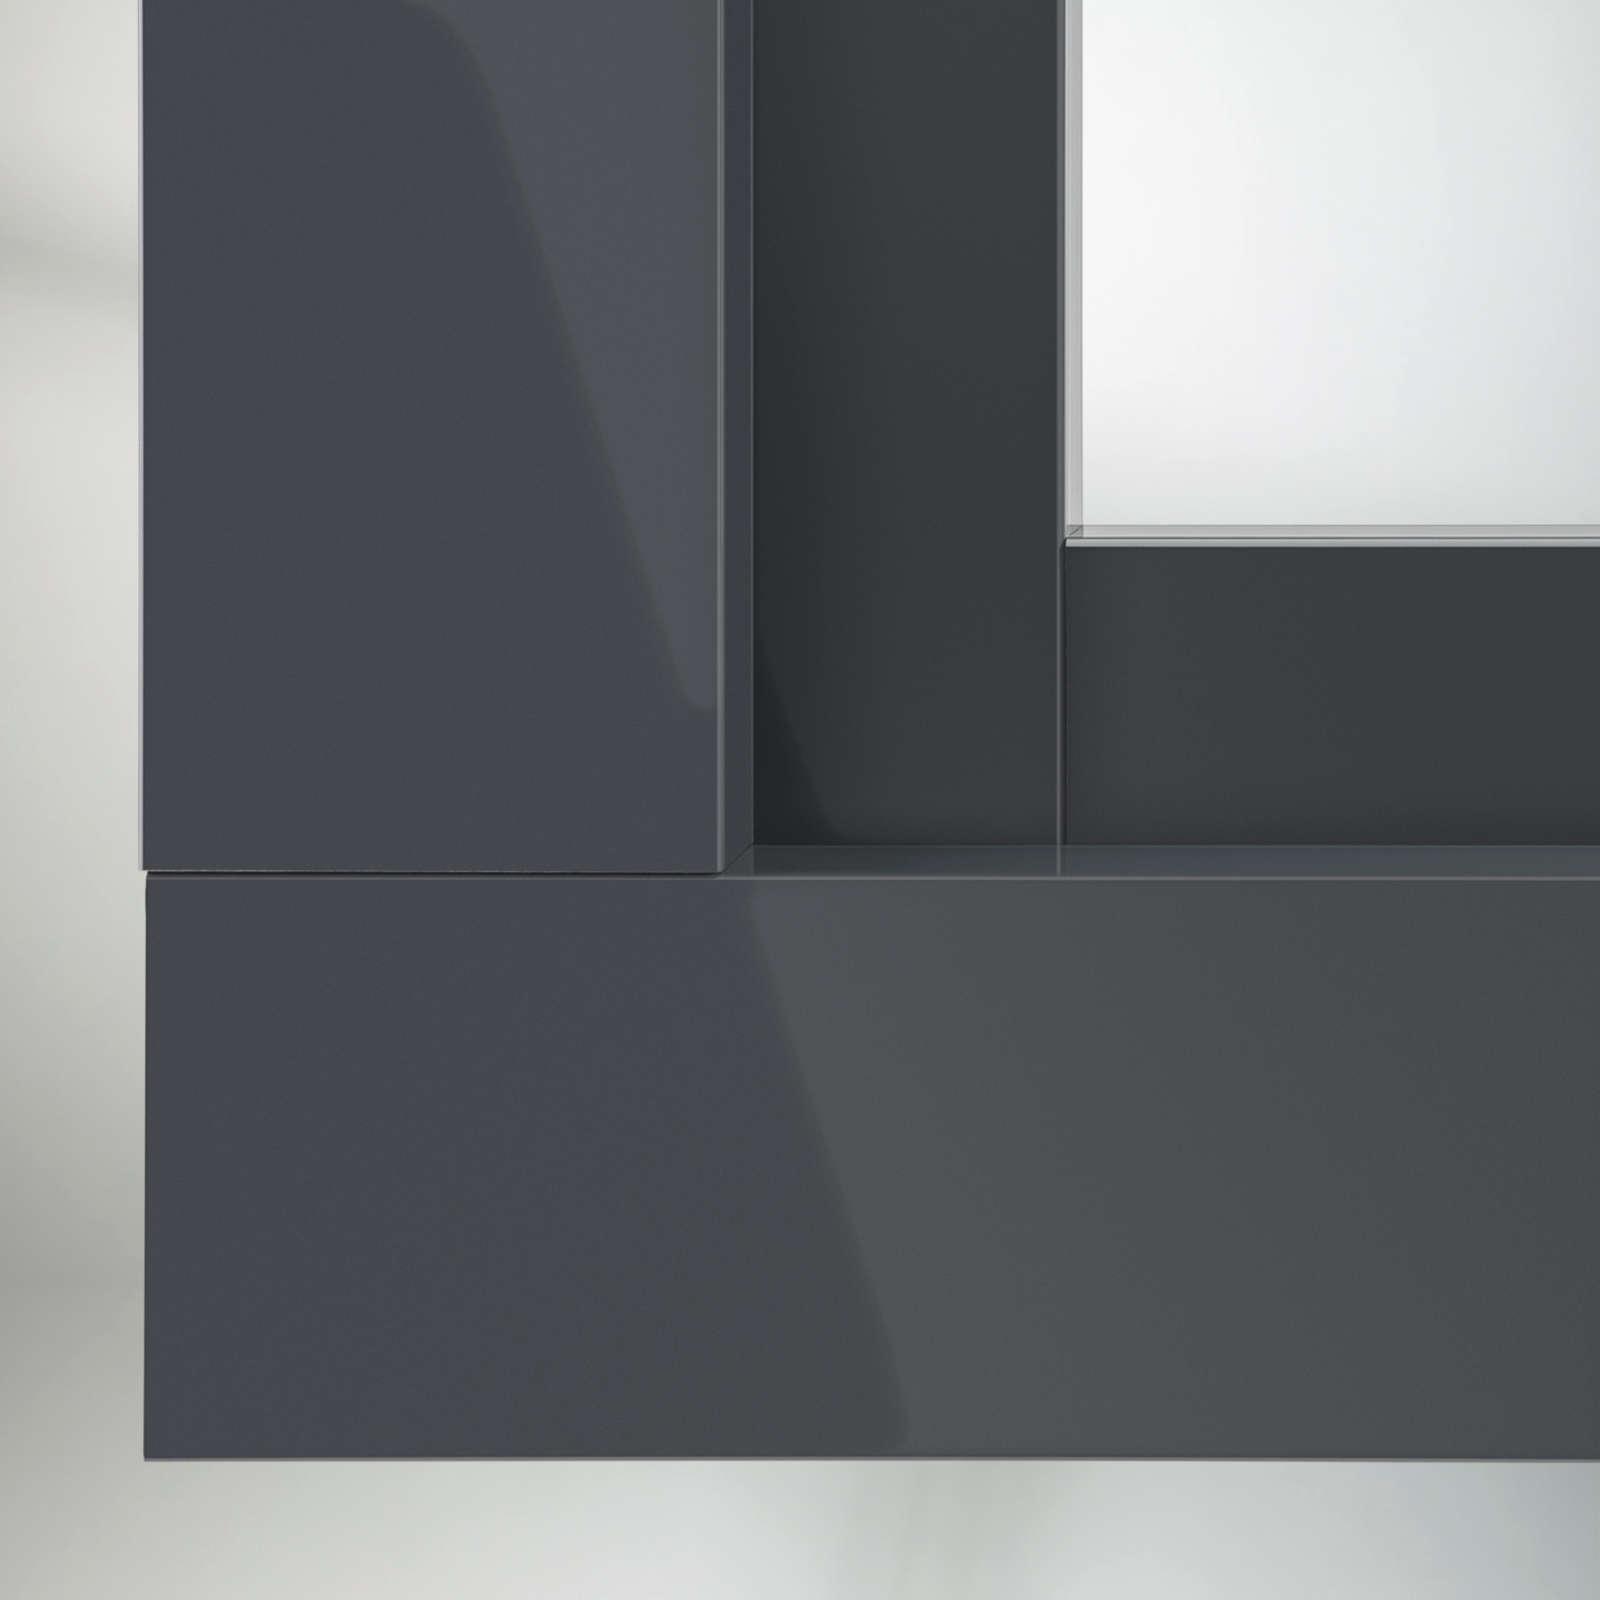 Termoplast - Janelas em PVC revestido de alumínio e Rau Fipro